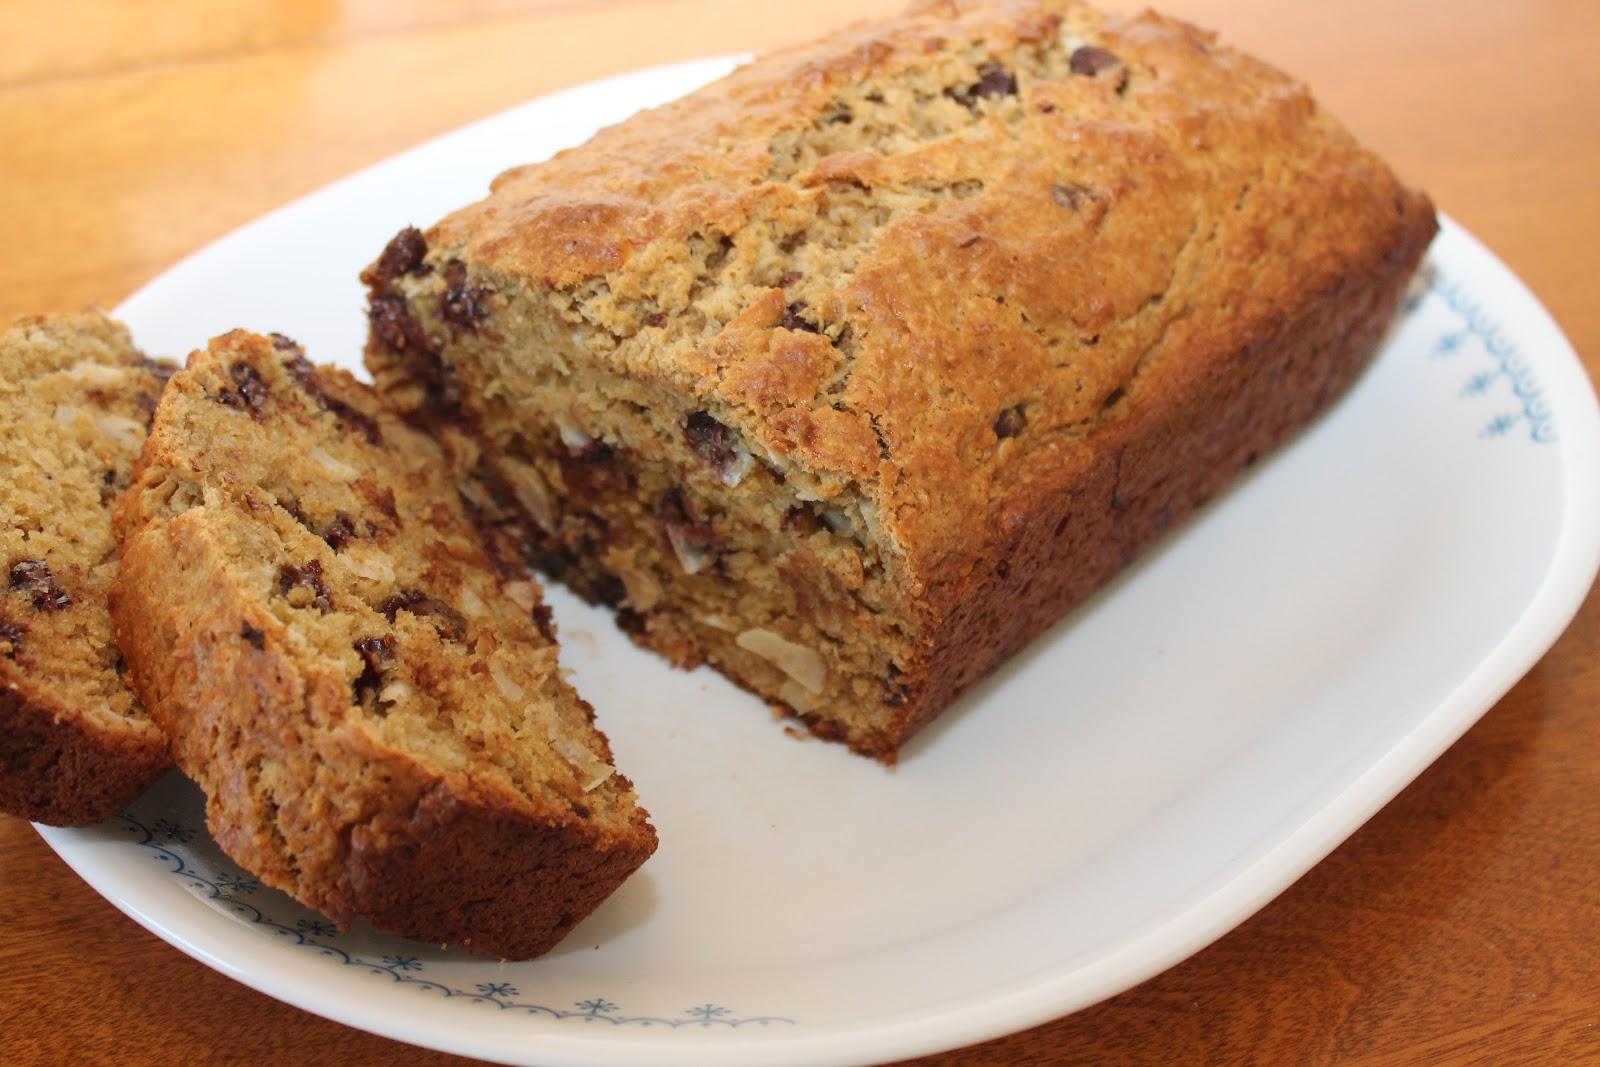 Savory Moments: Coconut chocolate chip banana bread